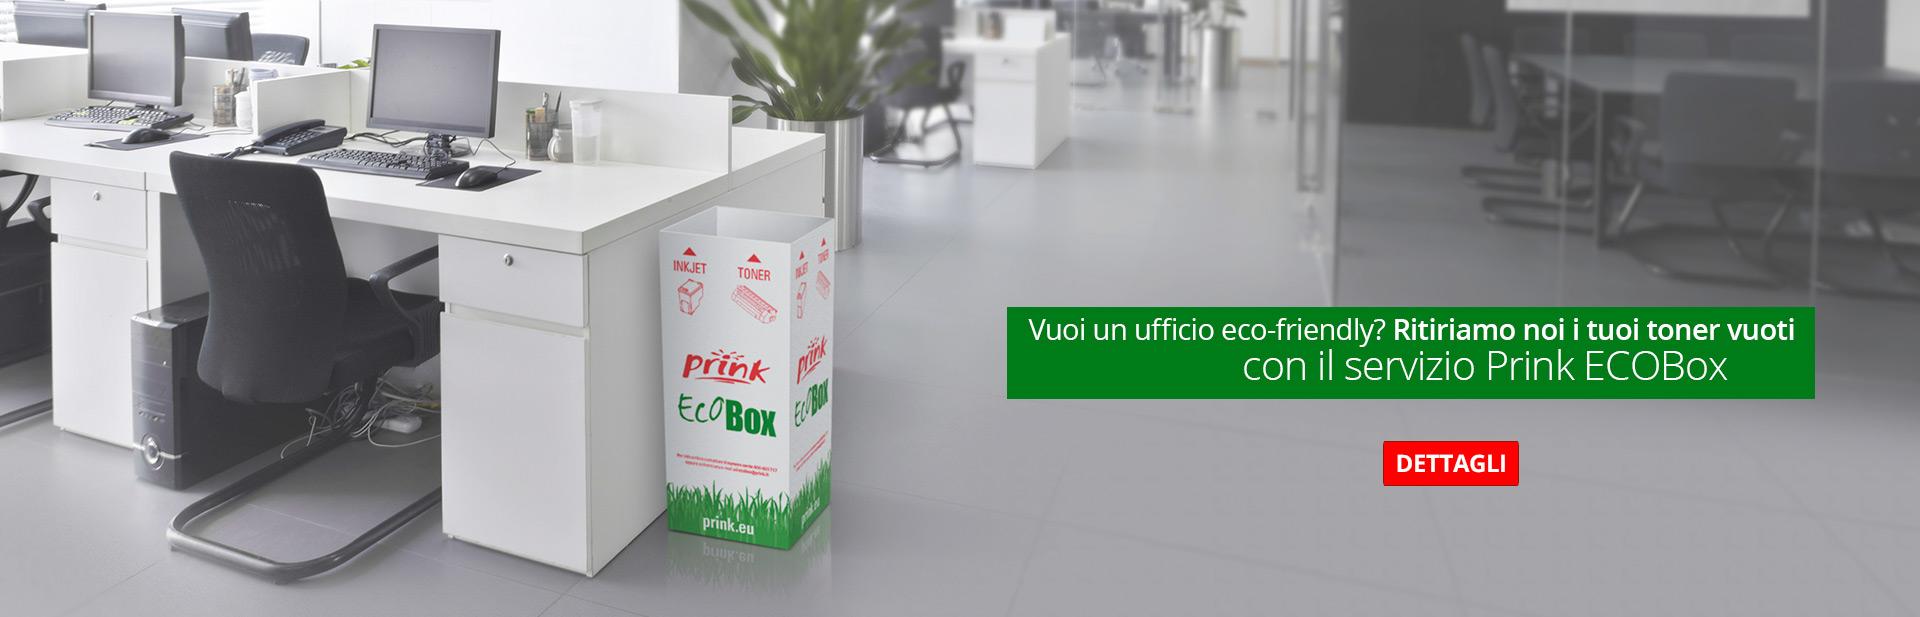 ritiro-toner-vuoti-Prink-ECObox-SL